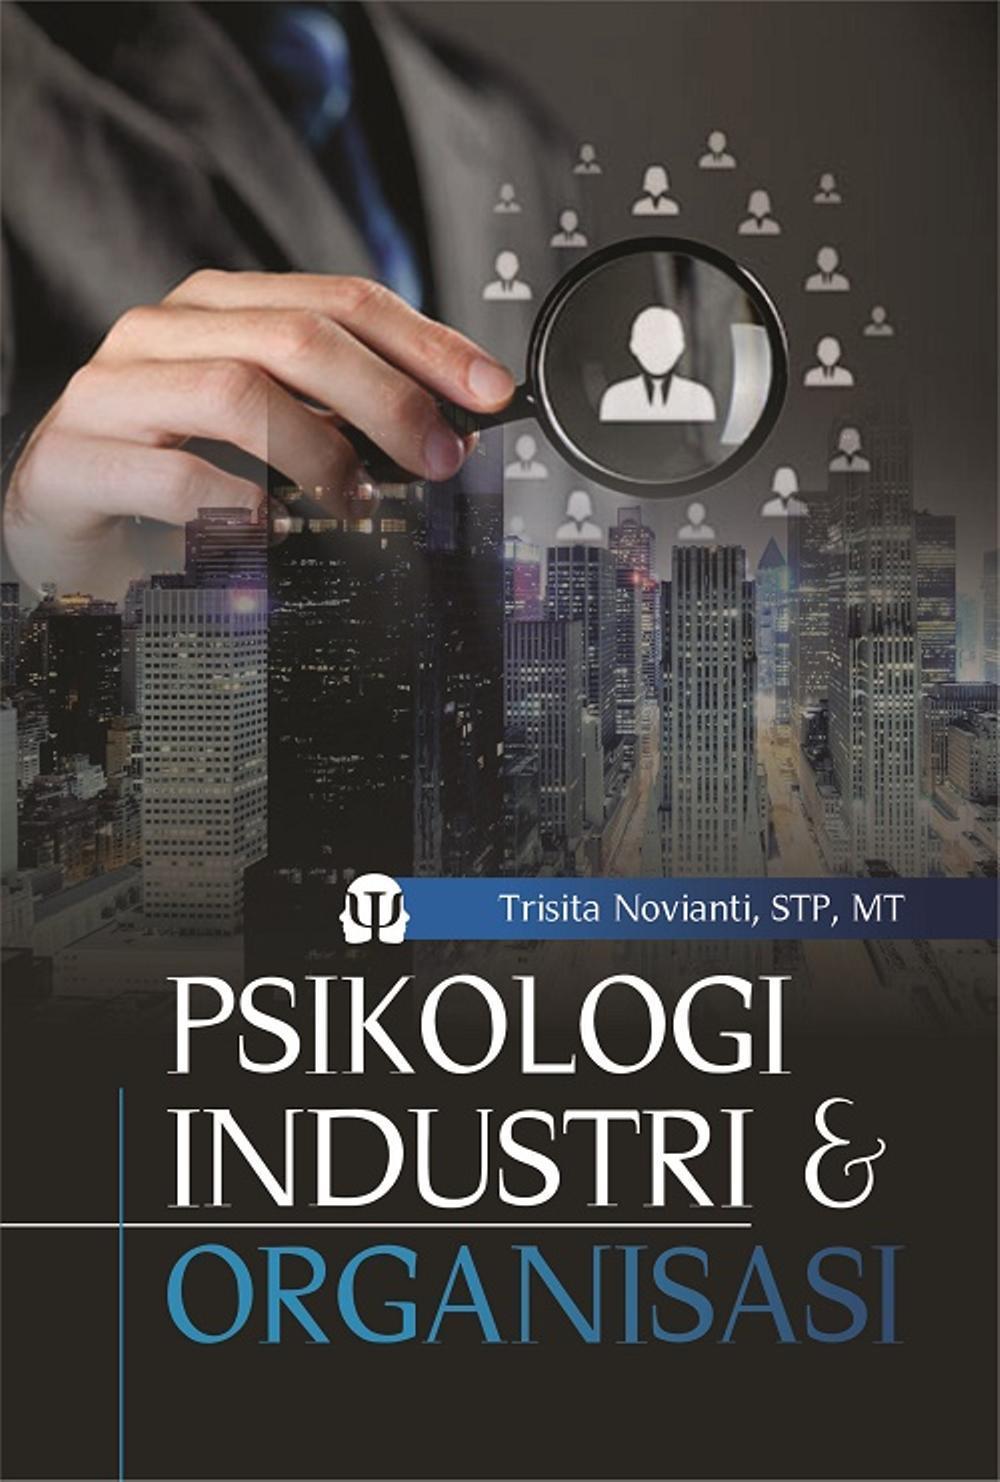 Buku Psikologi Industri Dan Organisasi - Trisita Novianti- STP.- MT. - Penerbit